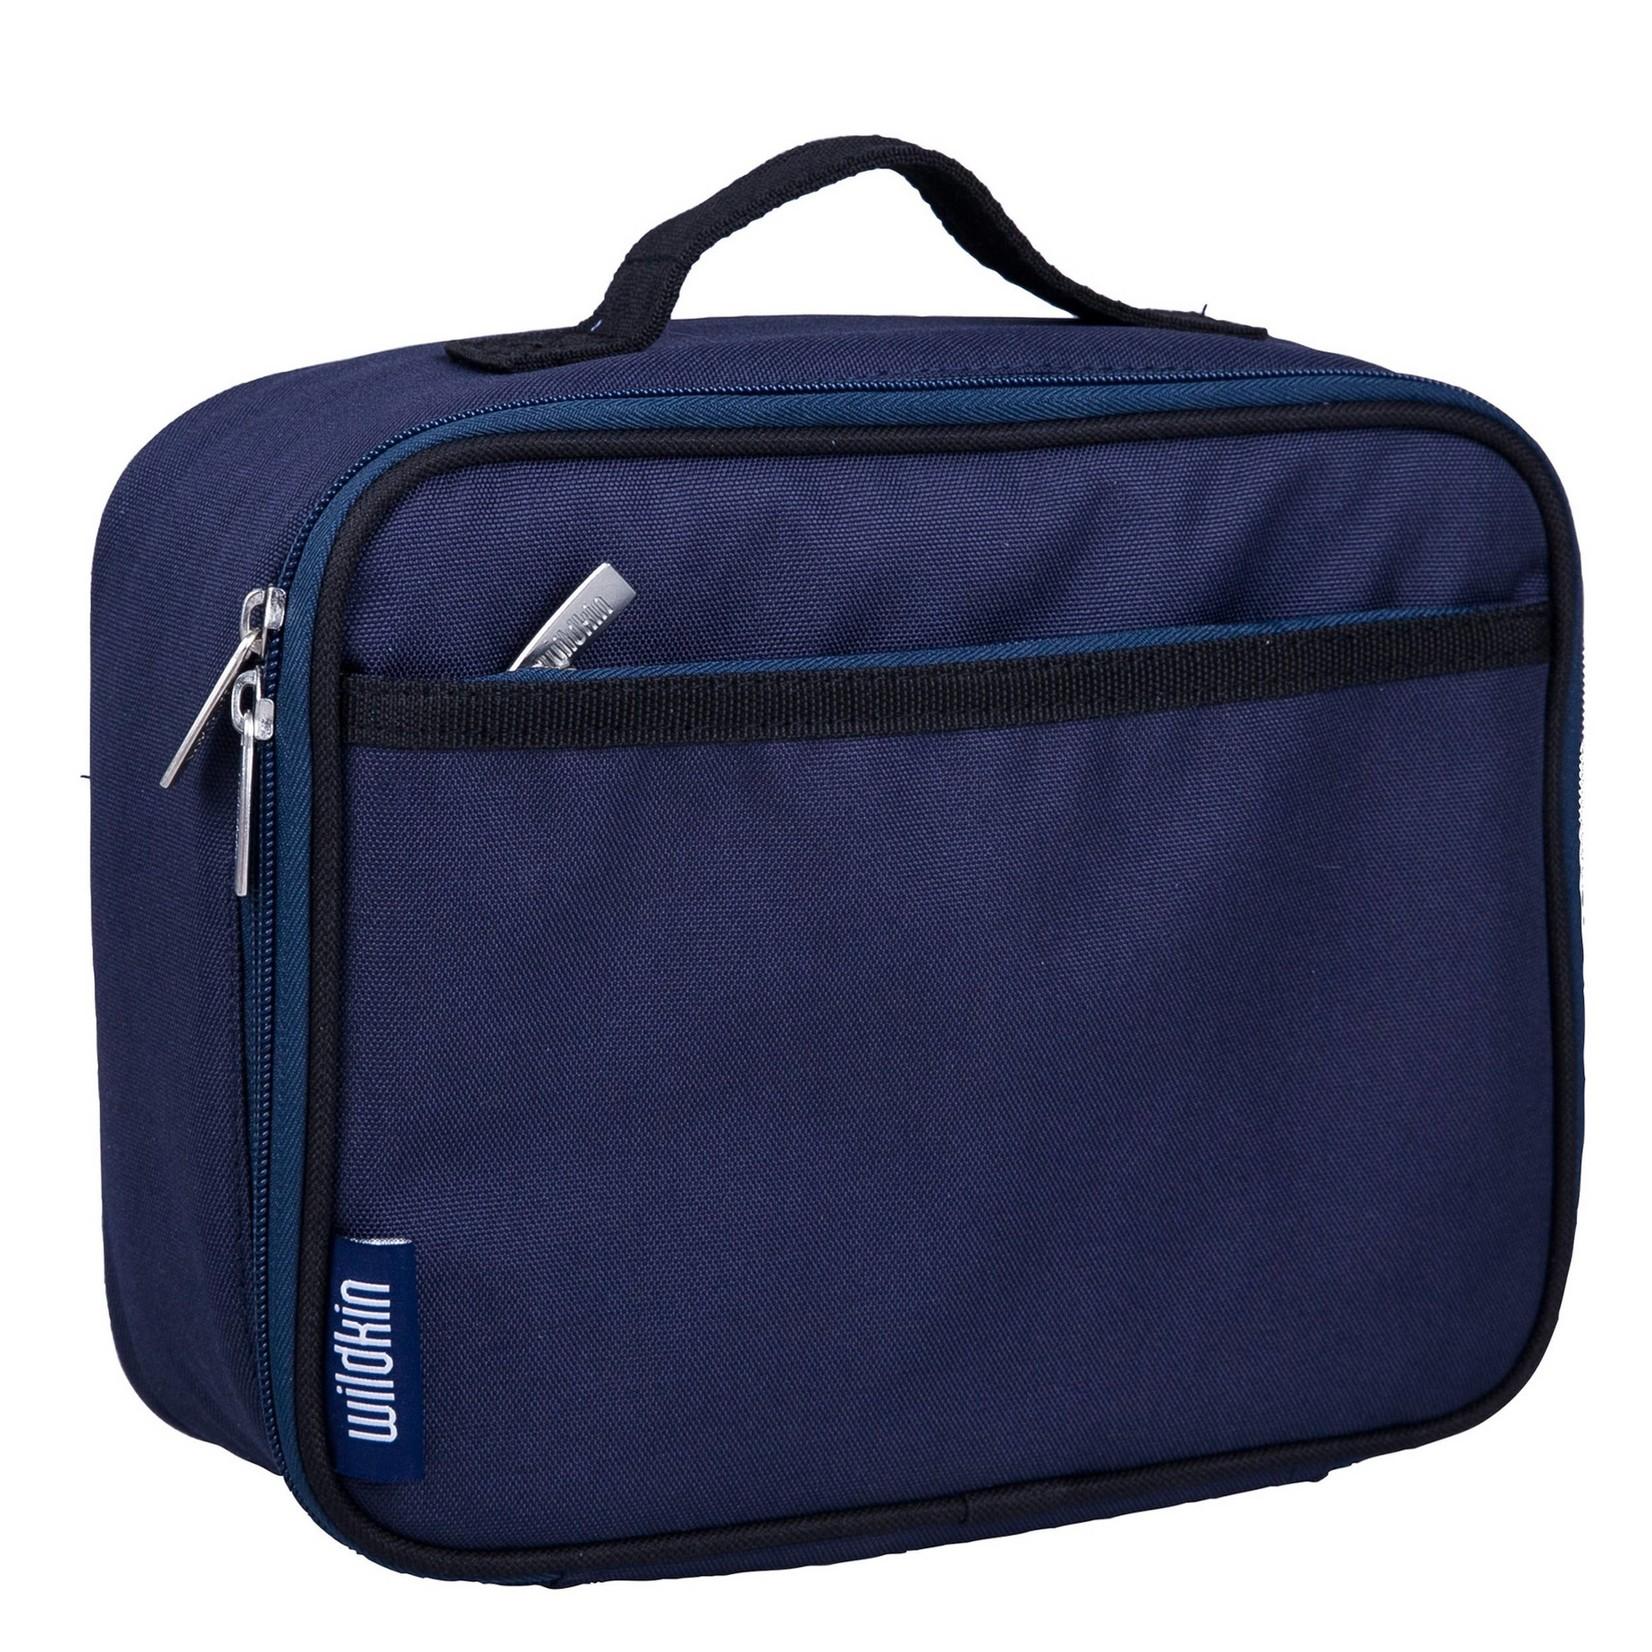 Whale Blue Lunch Box